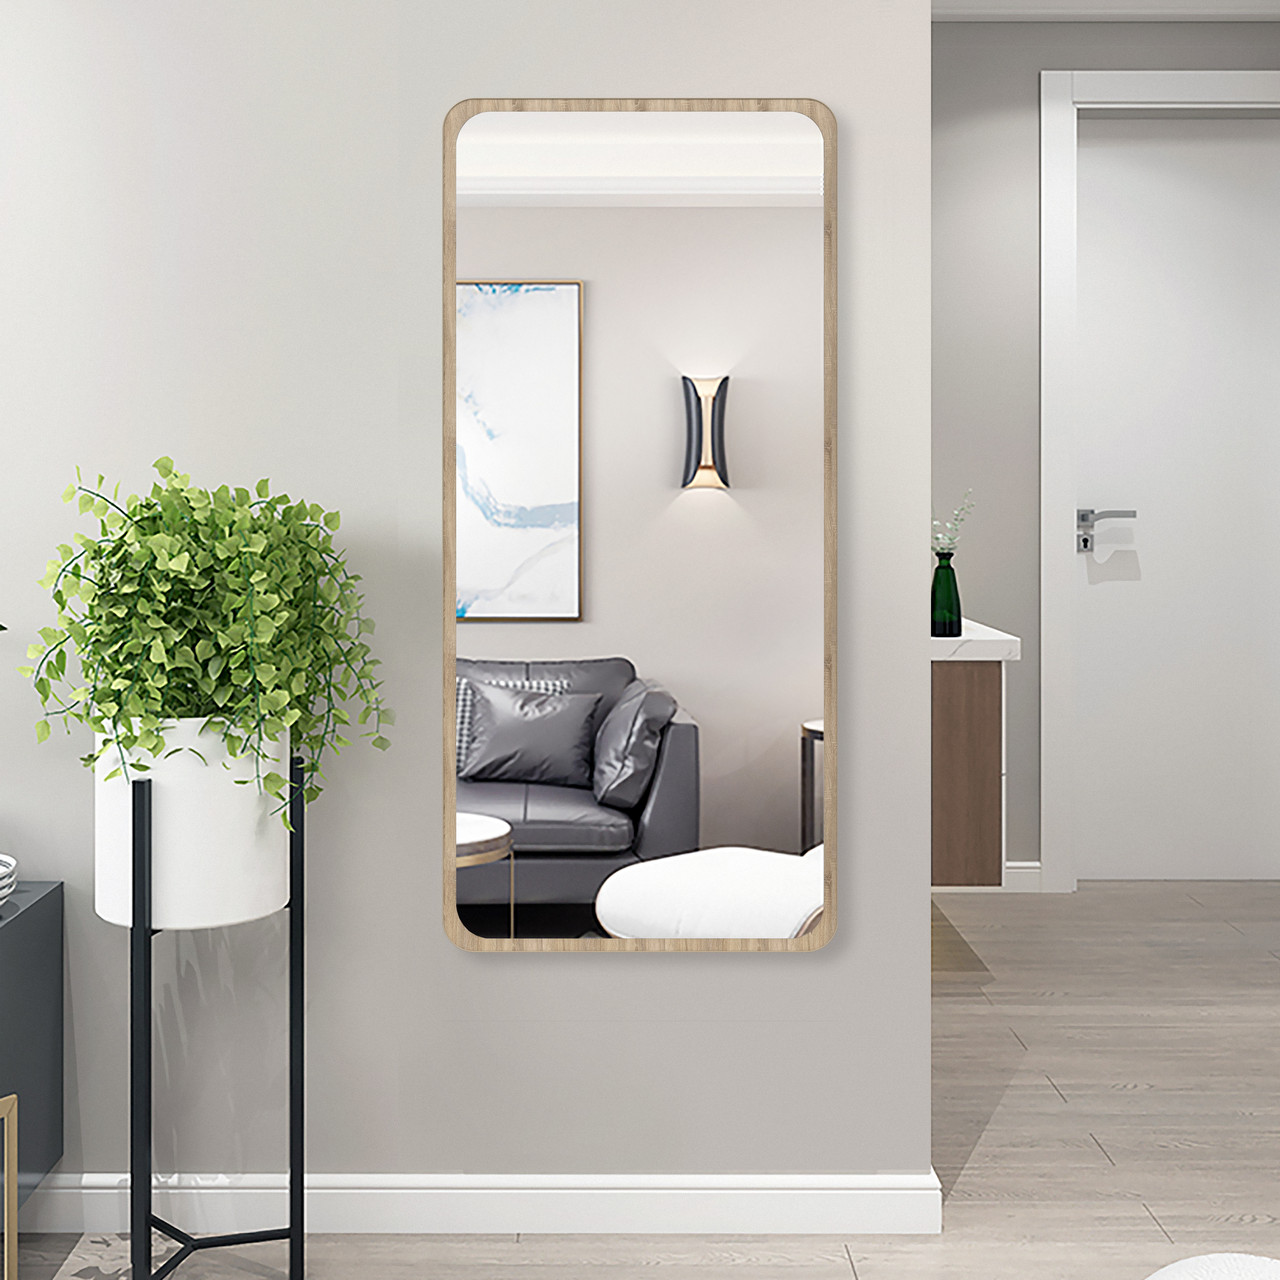 Зеркало в полный рост дуб сонома 1300 х 600 мм